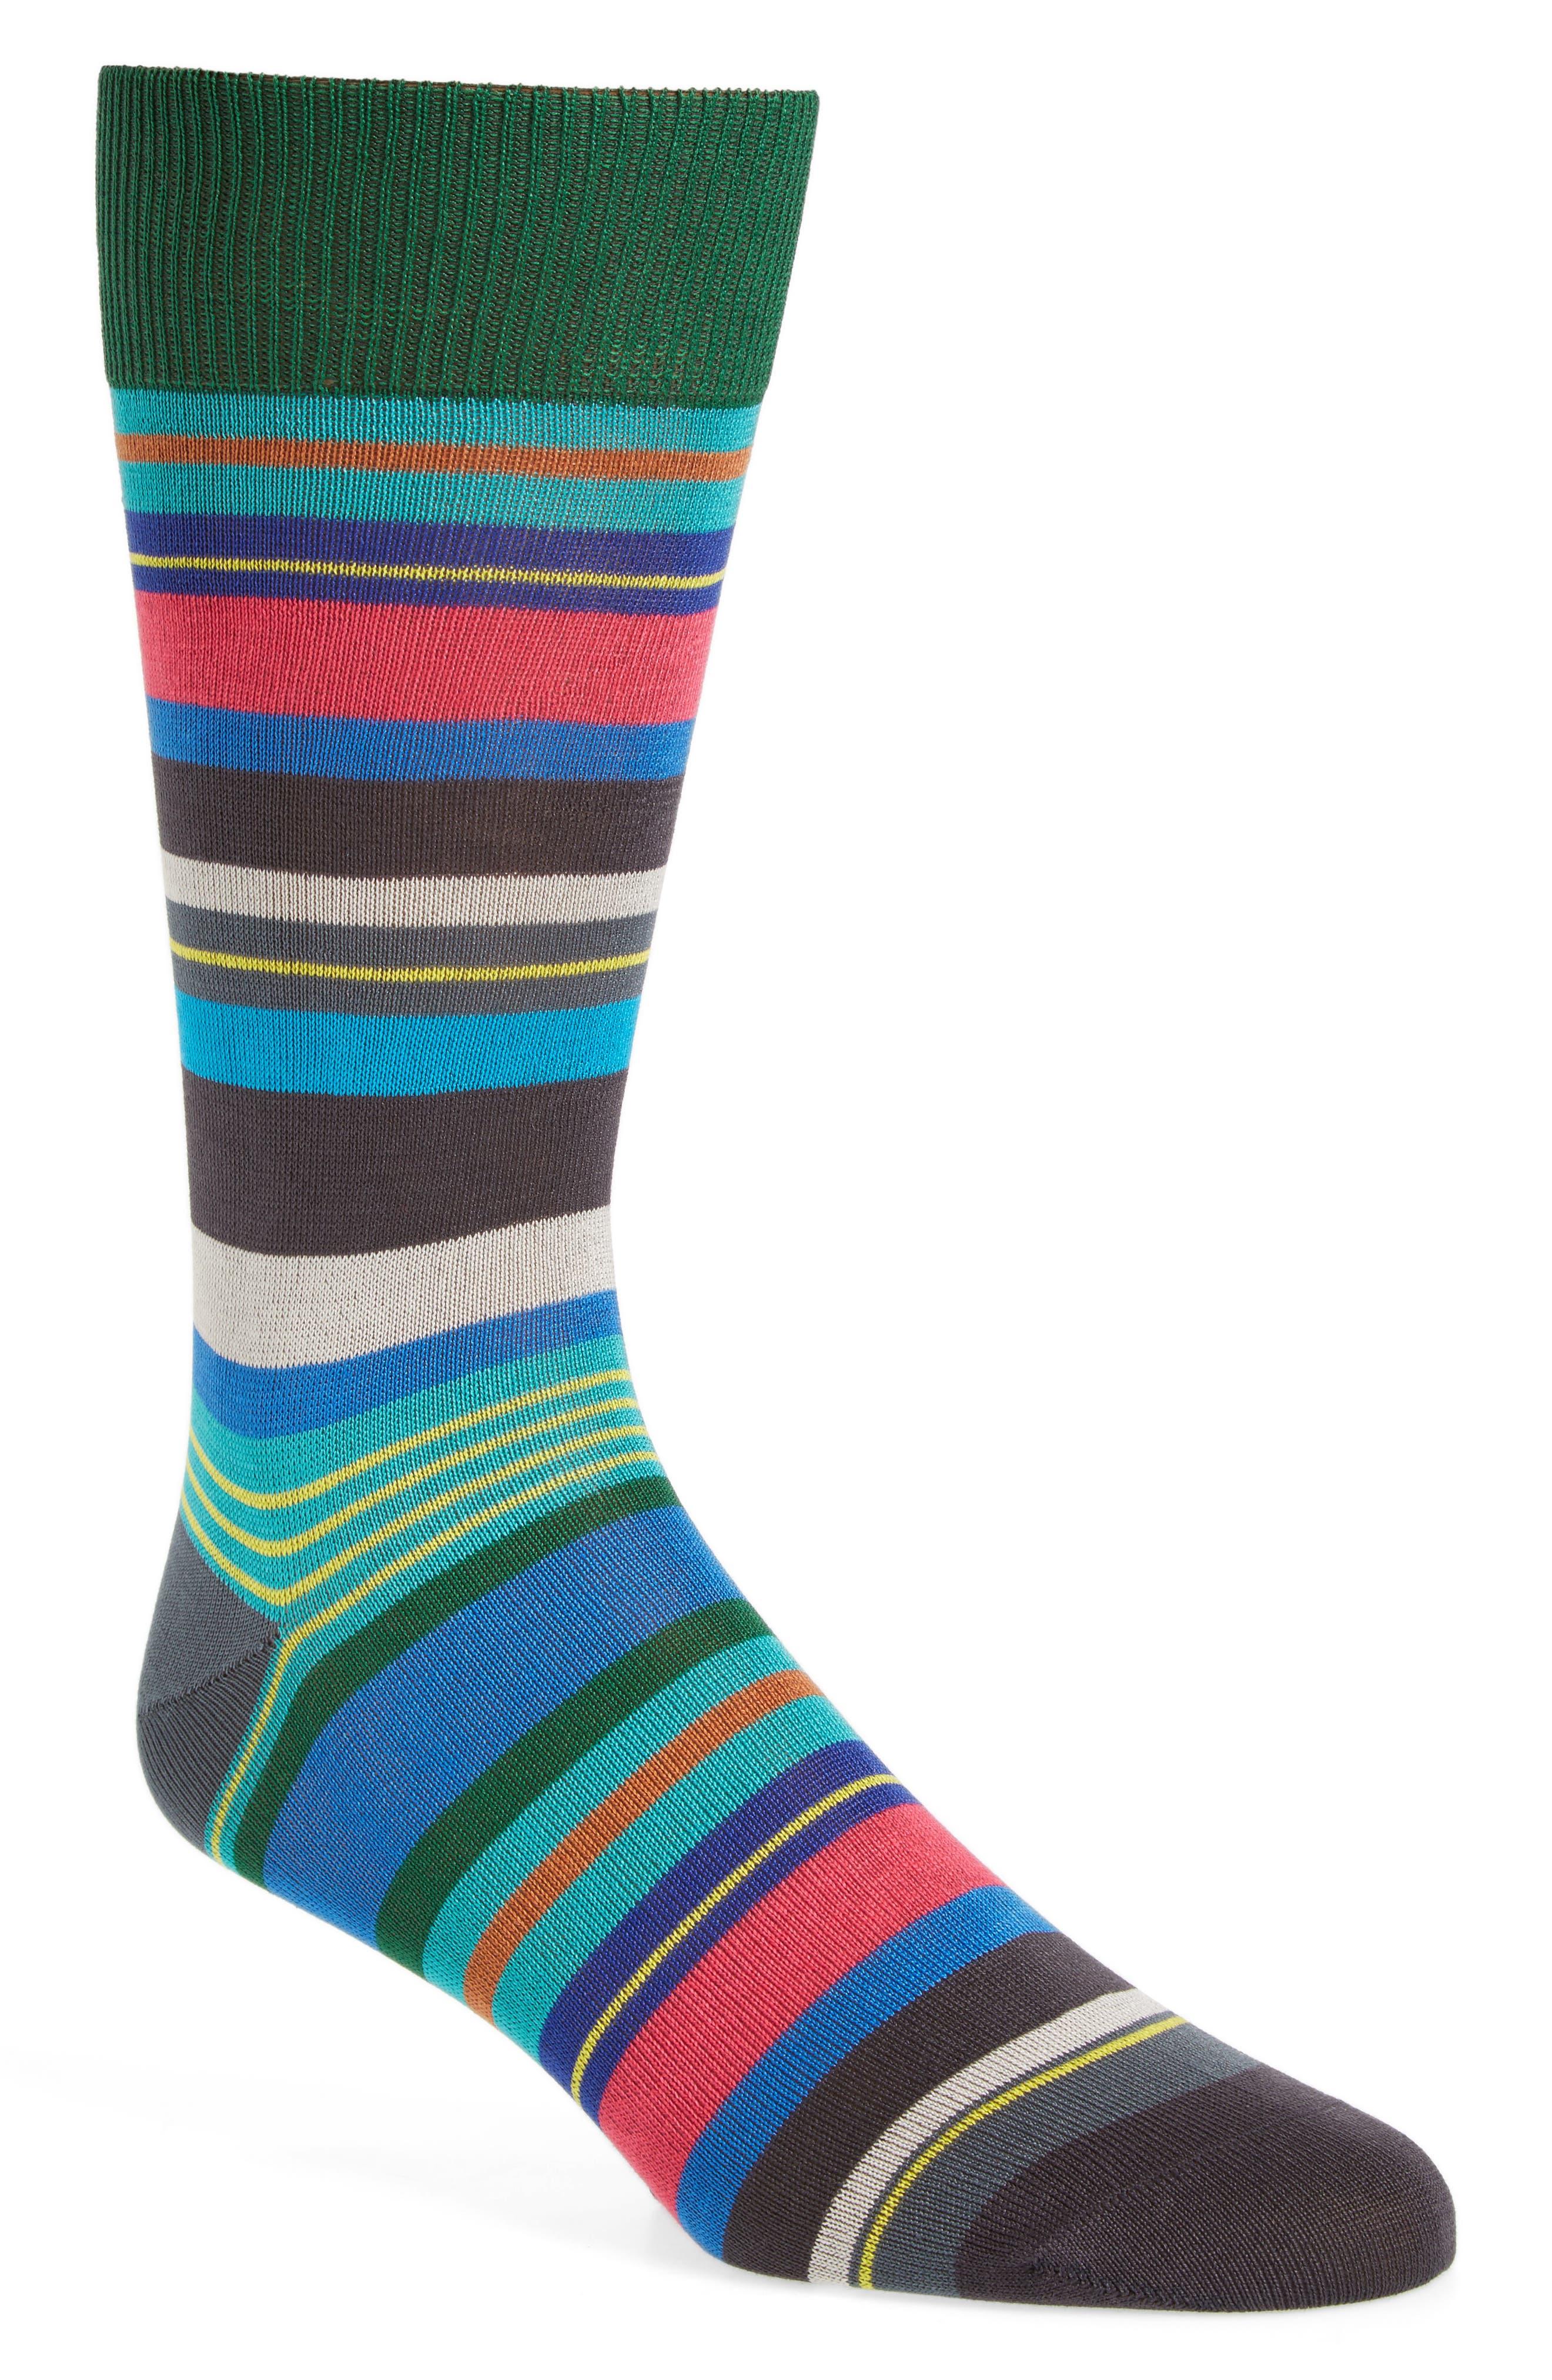 Halentoe Stripe Socks,                         Main,                         color, 001